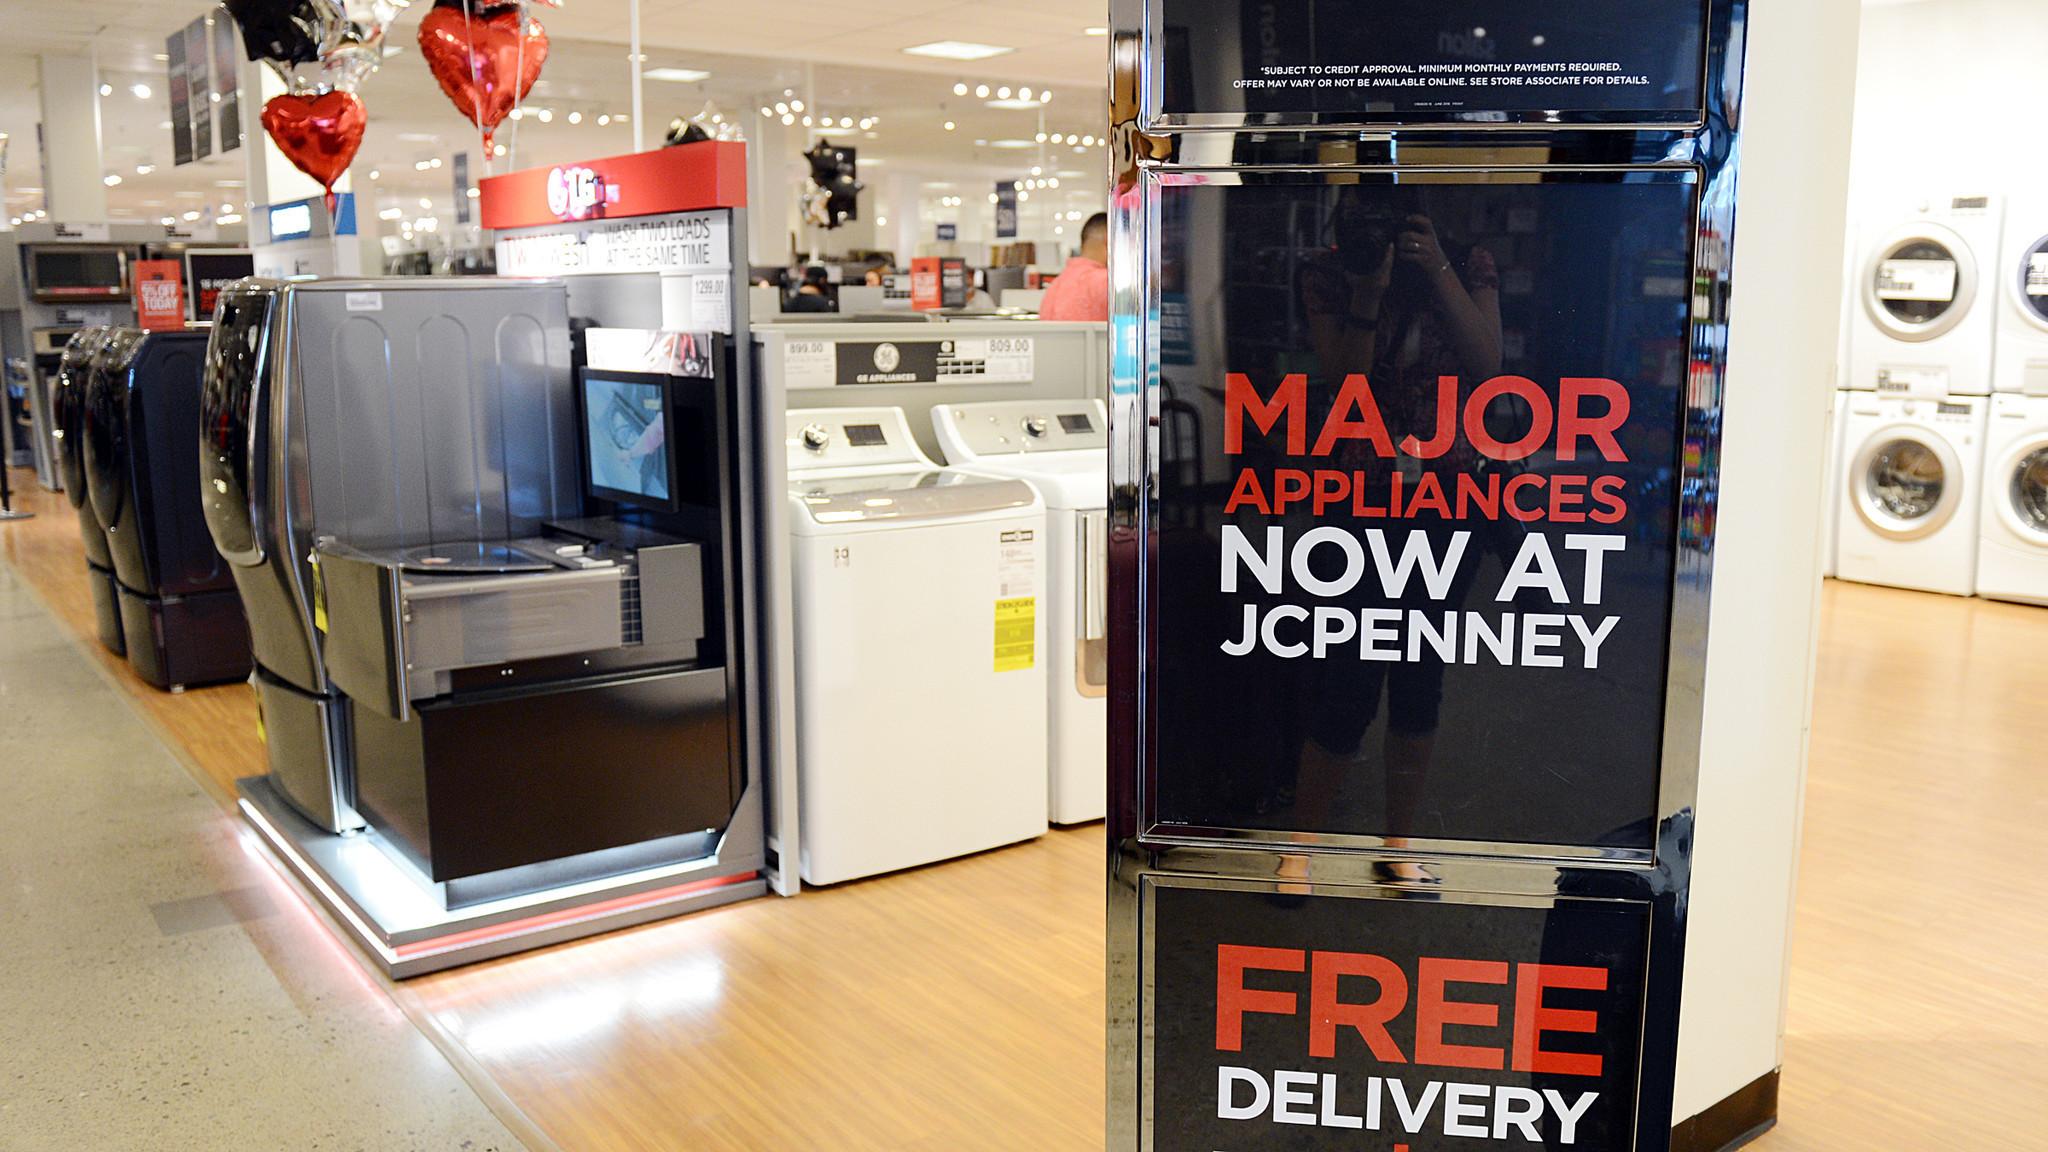 Jcpenney In Abingdon Adds Major Appliance Showroom